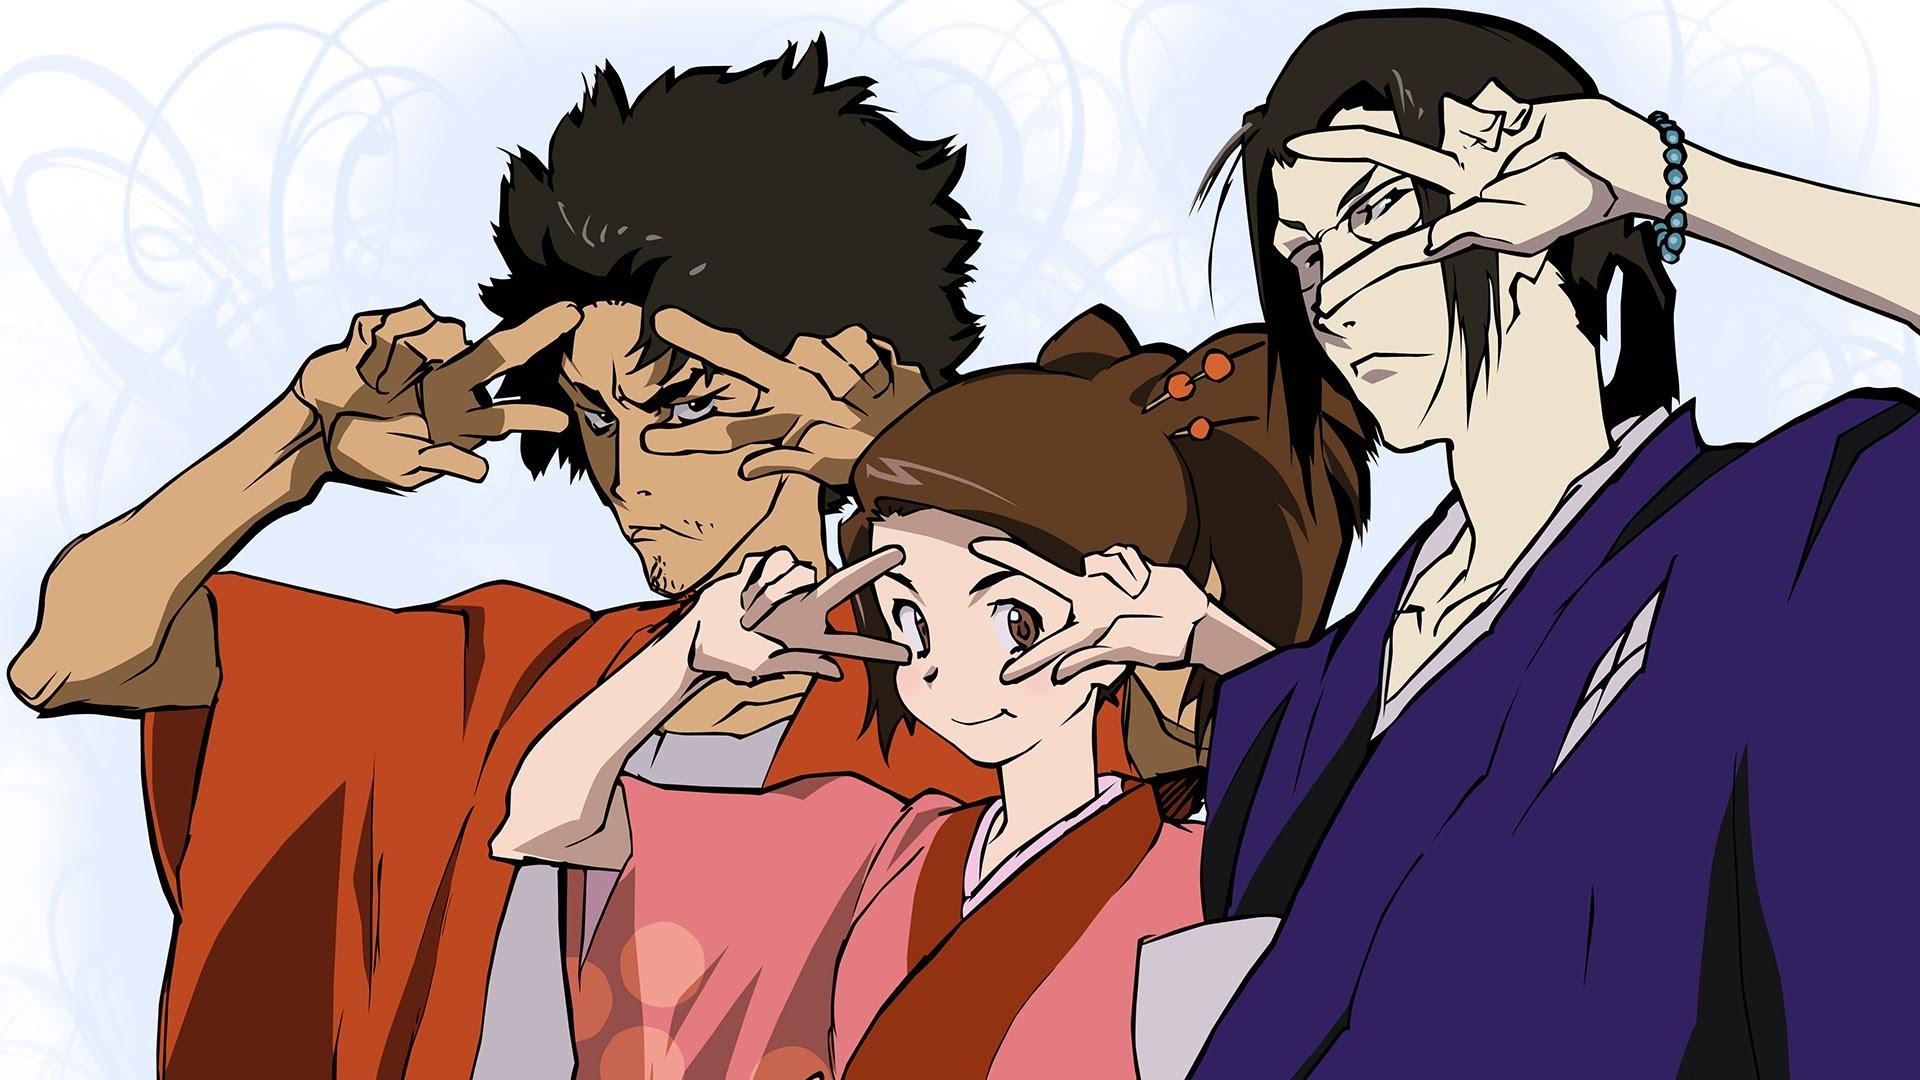 Anime 1920x1080 Jin (Samurai Champloo) Fuu anime boys anime anime girls